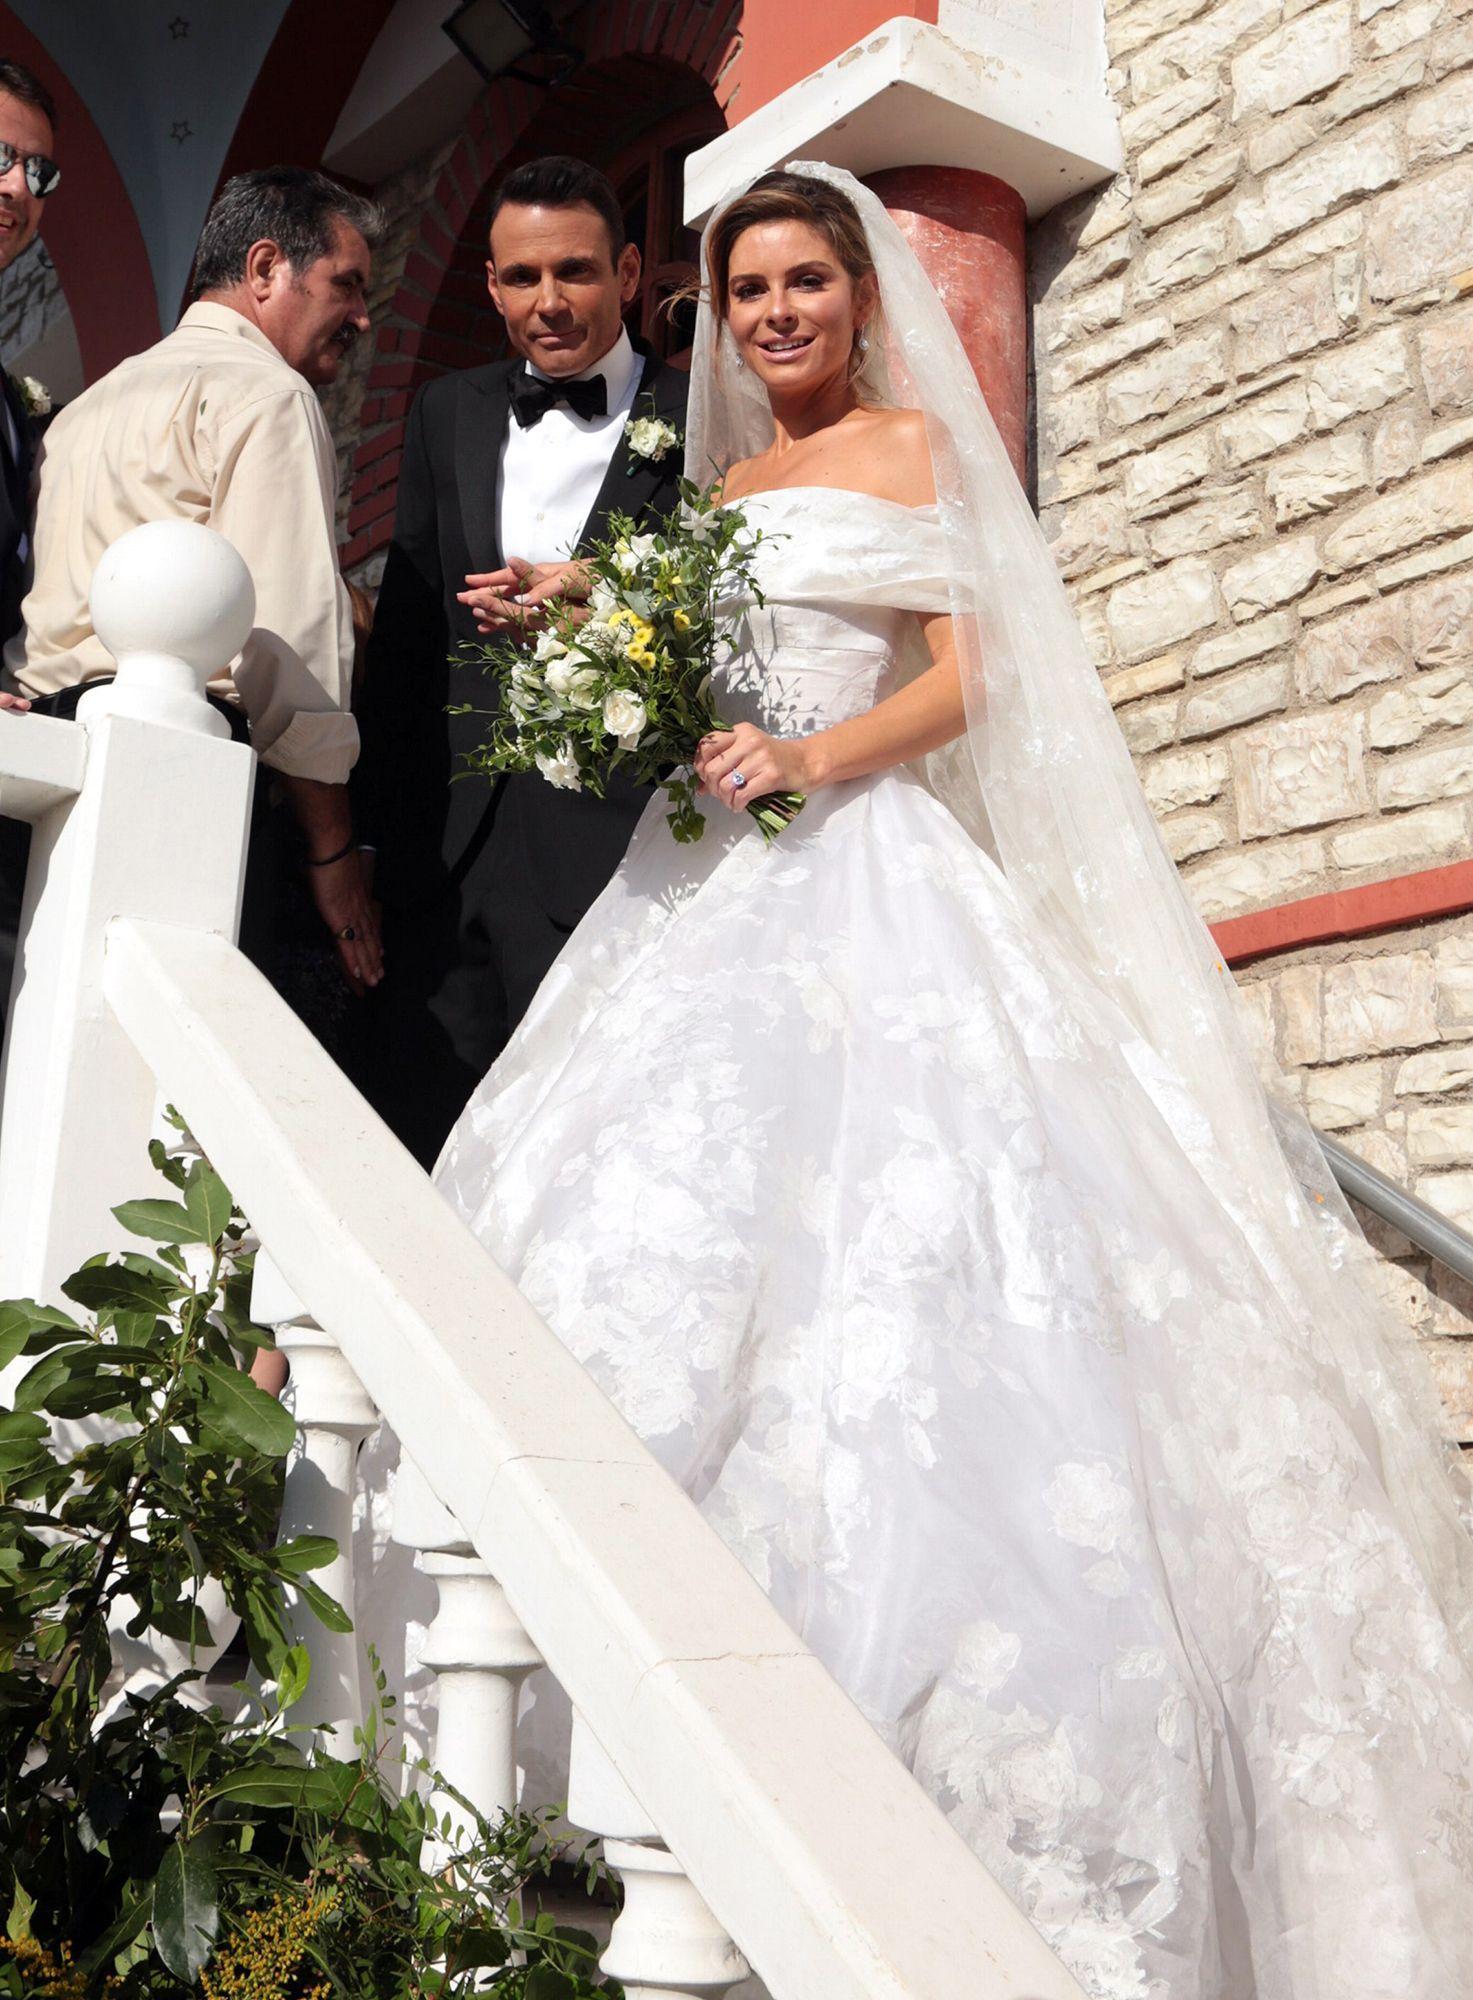 Maria menounos shares breathtaking photos of her big greek wedding